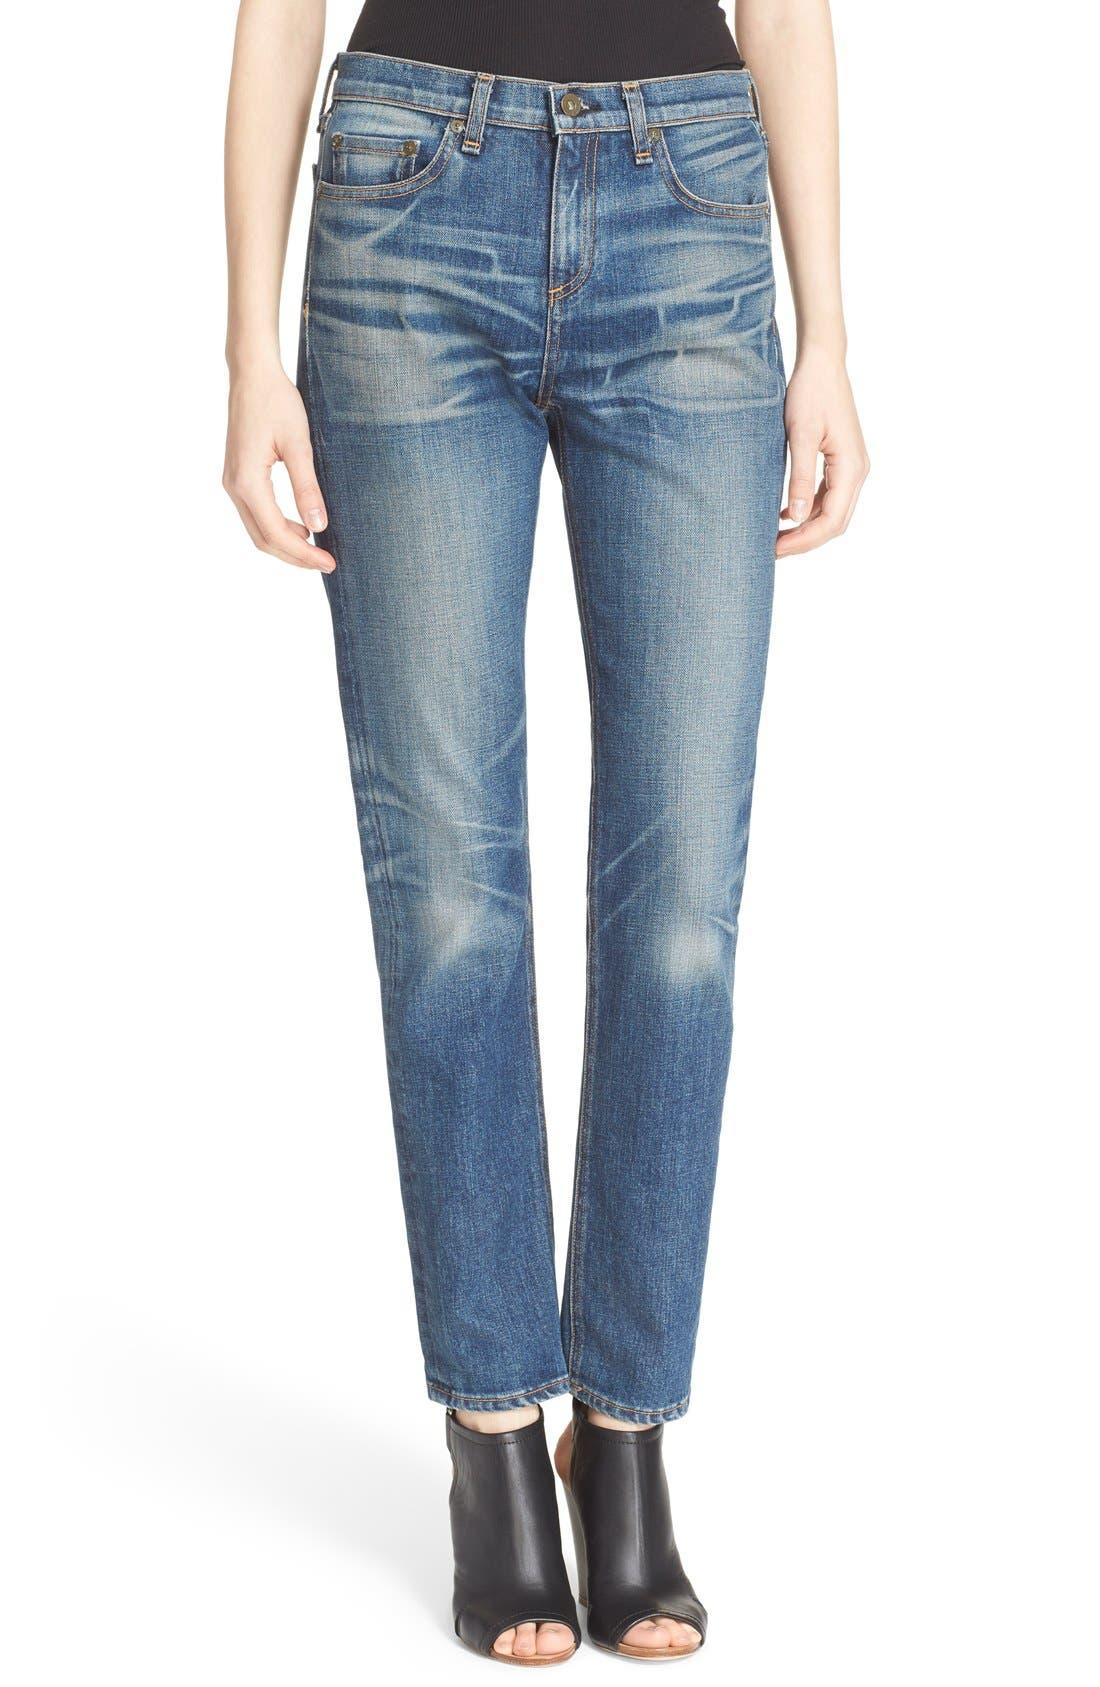 Main Image - rag & bone/JEAN 'Dre' High Rise Boyfriend Skinny Jeans (Exeter)